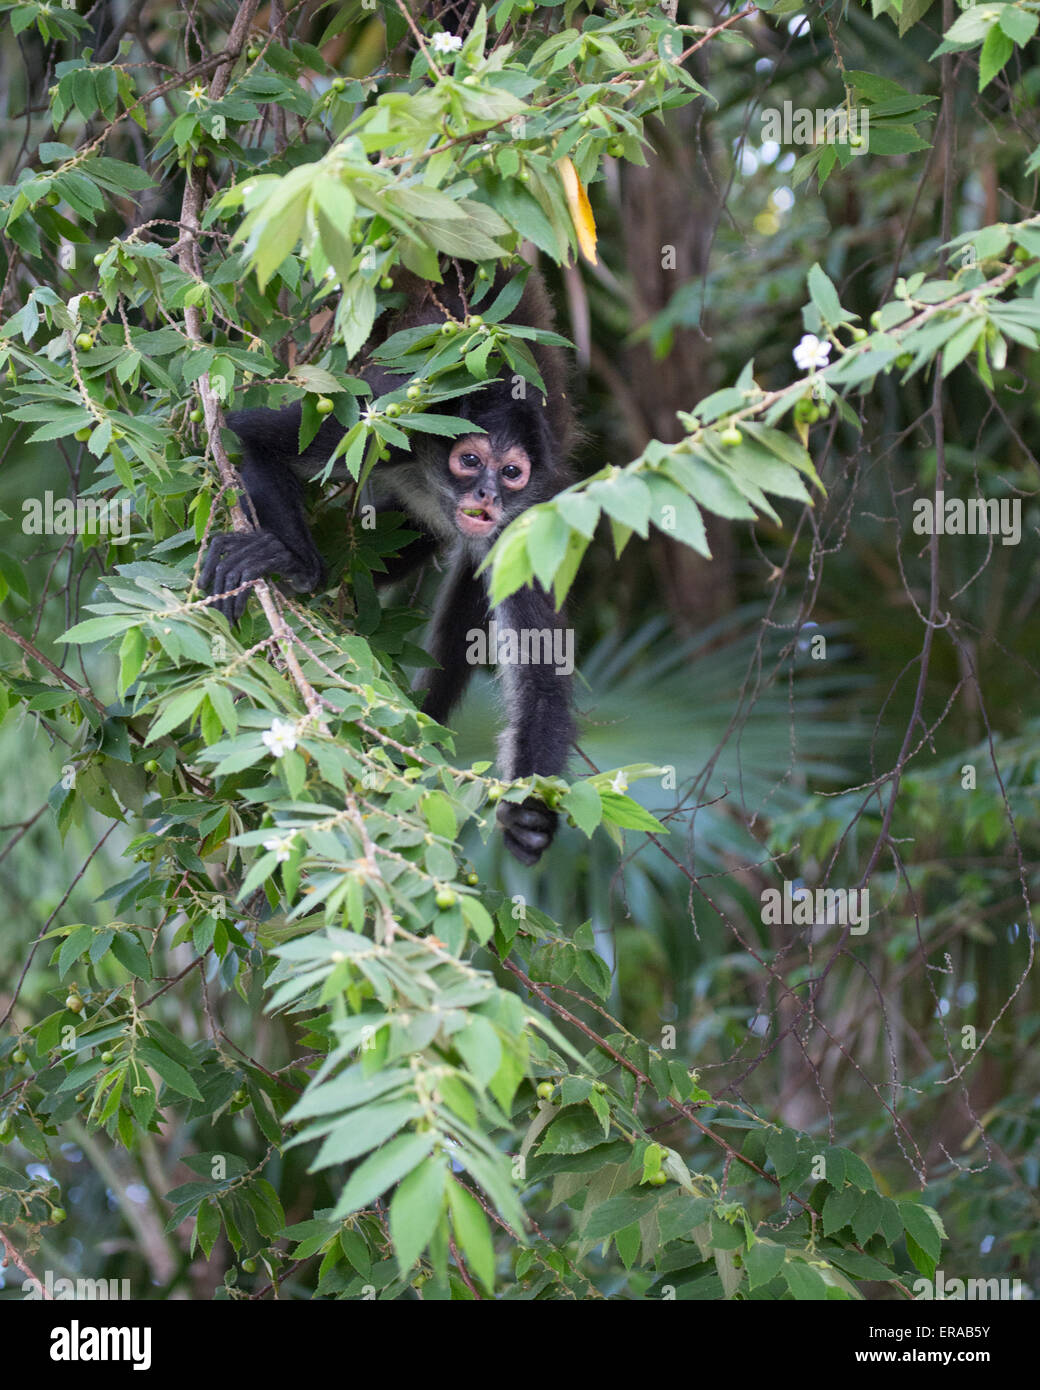 Geoffroy's spider monkey (Ateles geoffroyi), aka Black-handed Spider Monkey peering through leaves - Stock Image